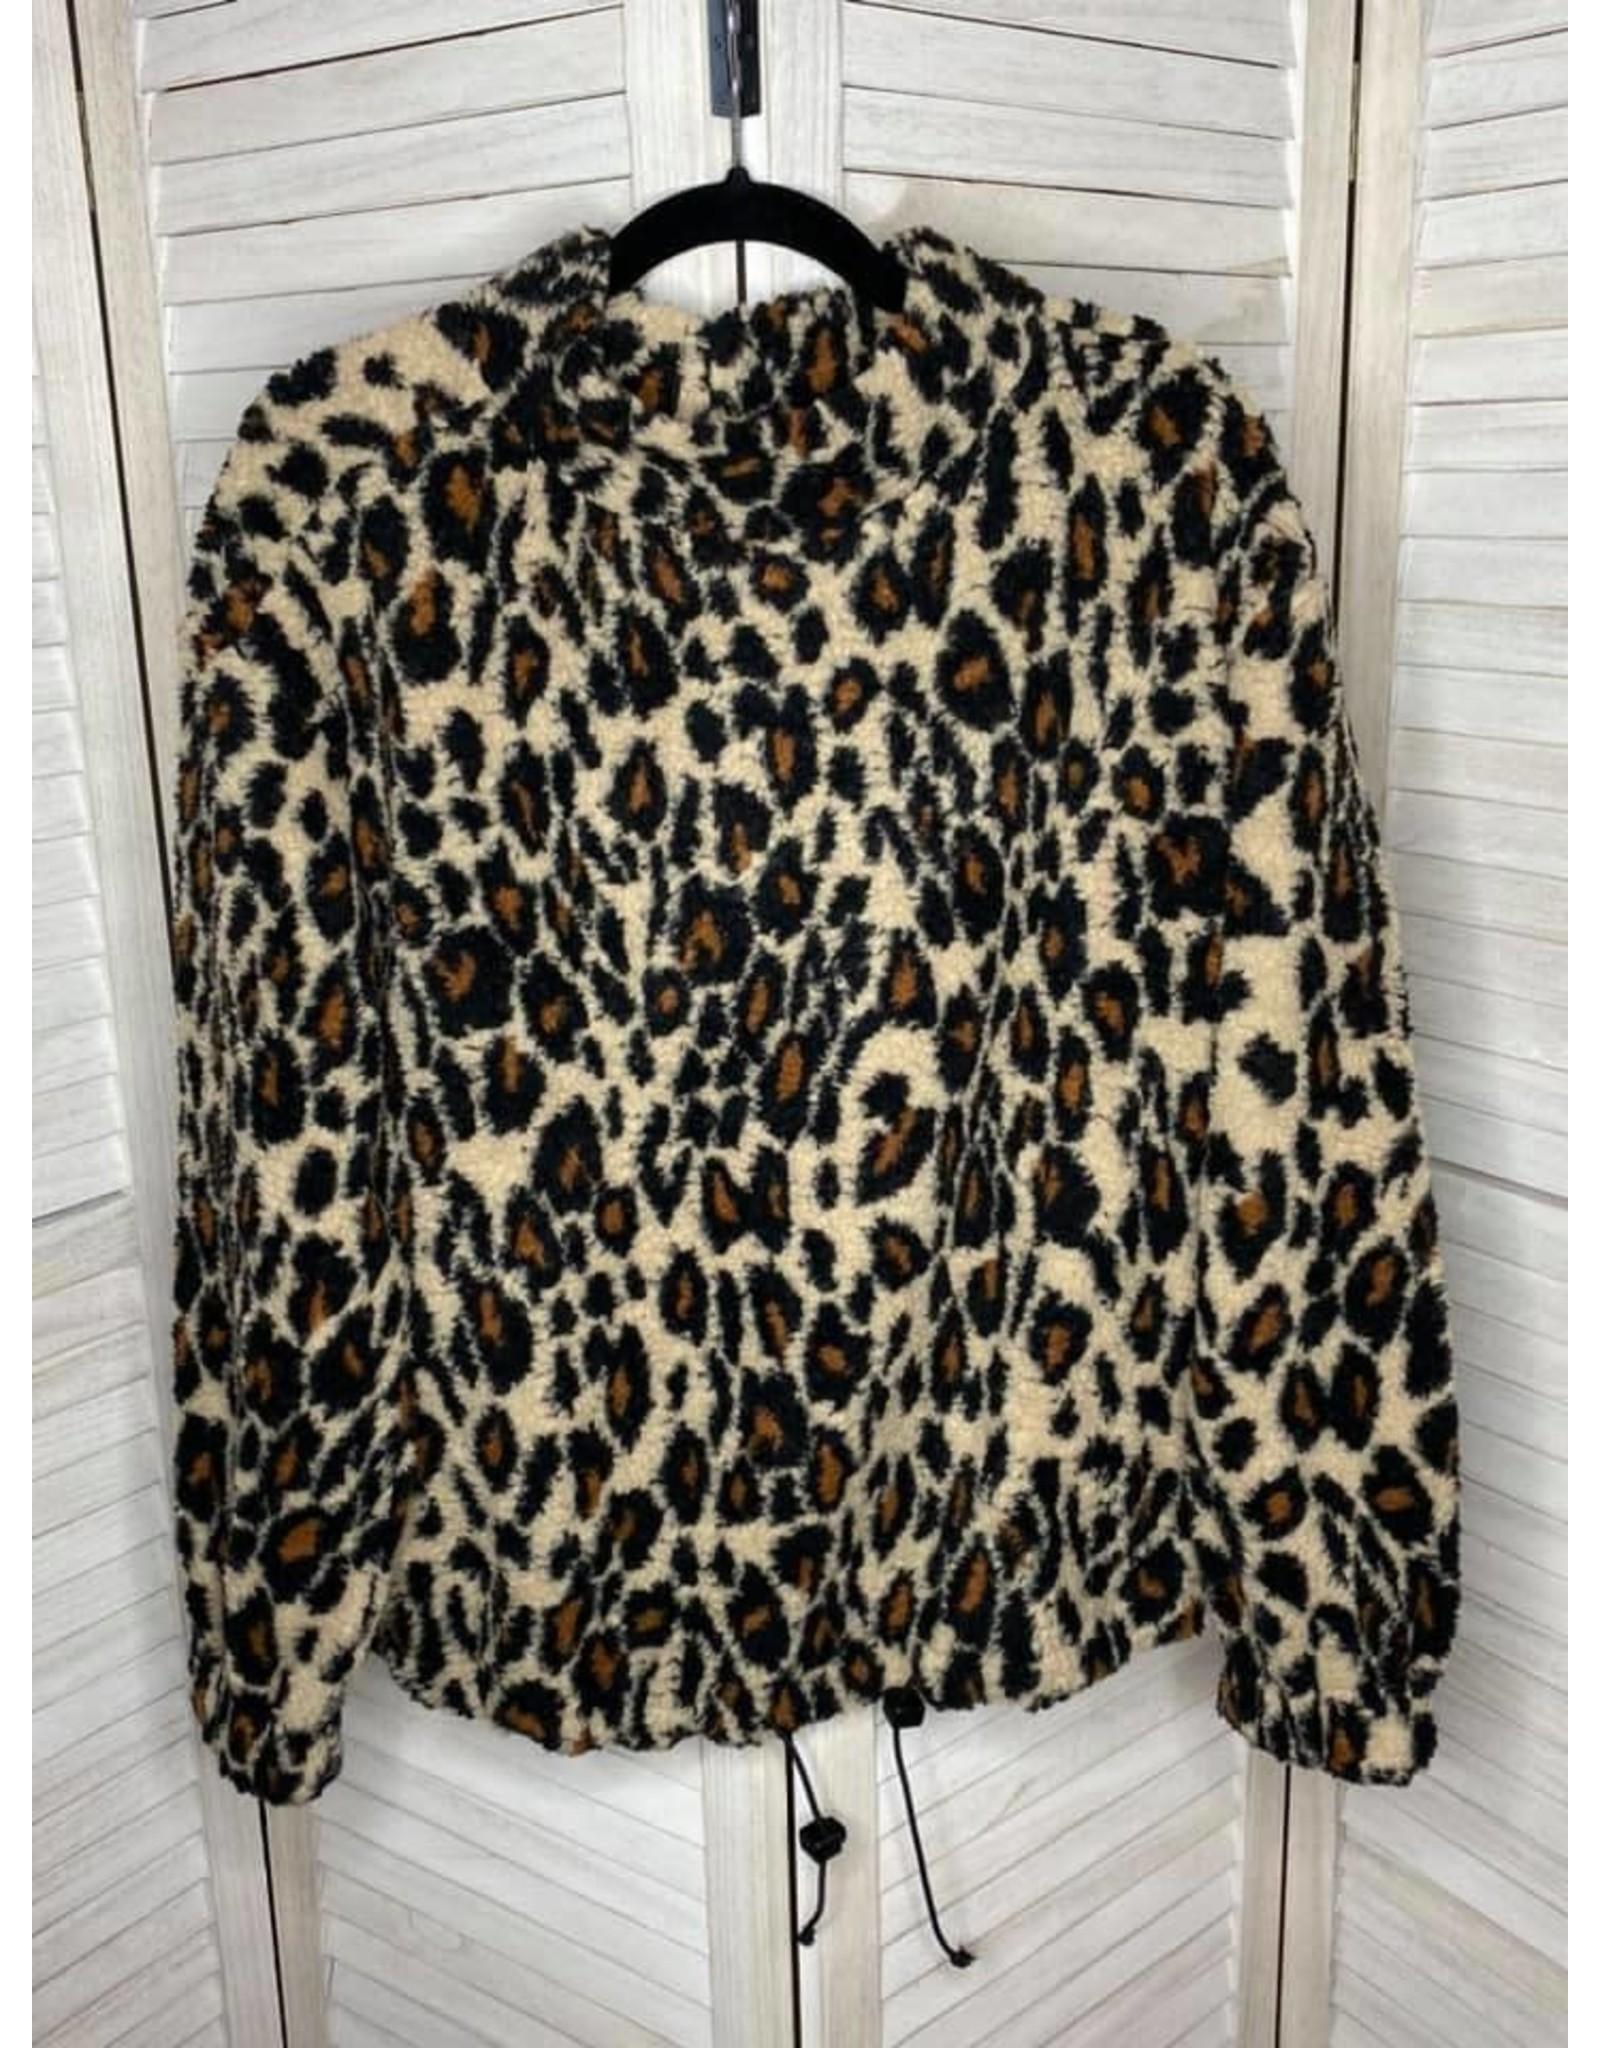 Kori America Leopard Mock Neck Sherpa Top/Coat